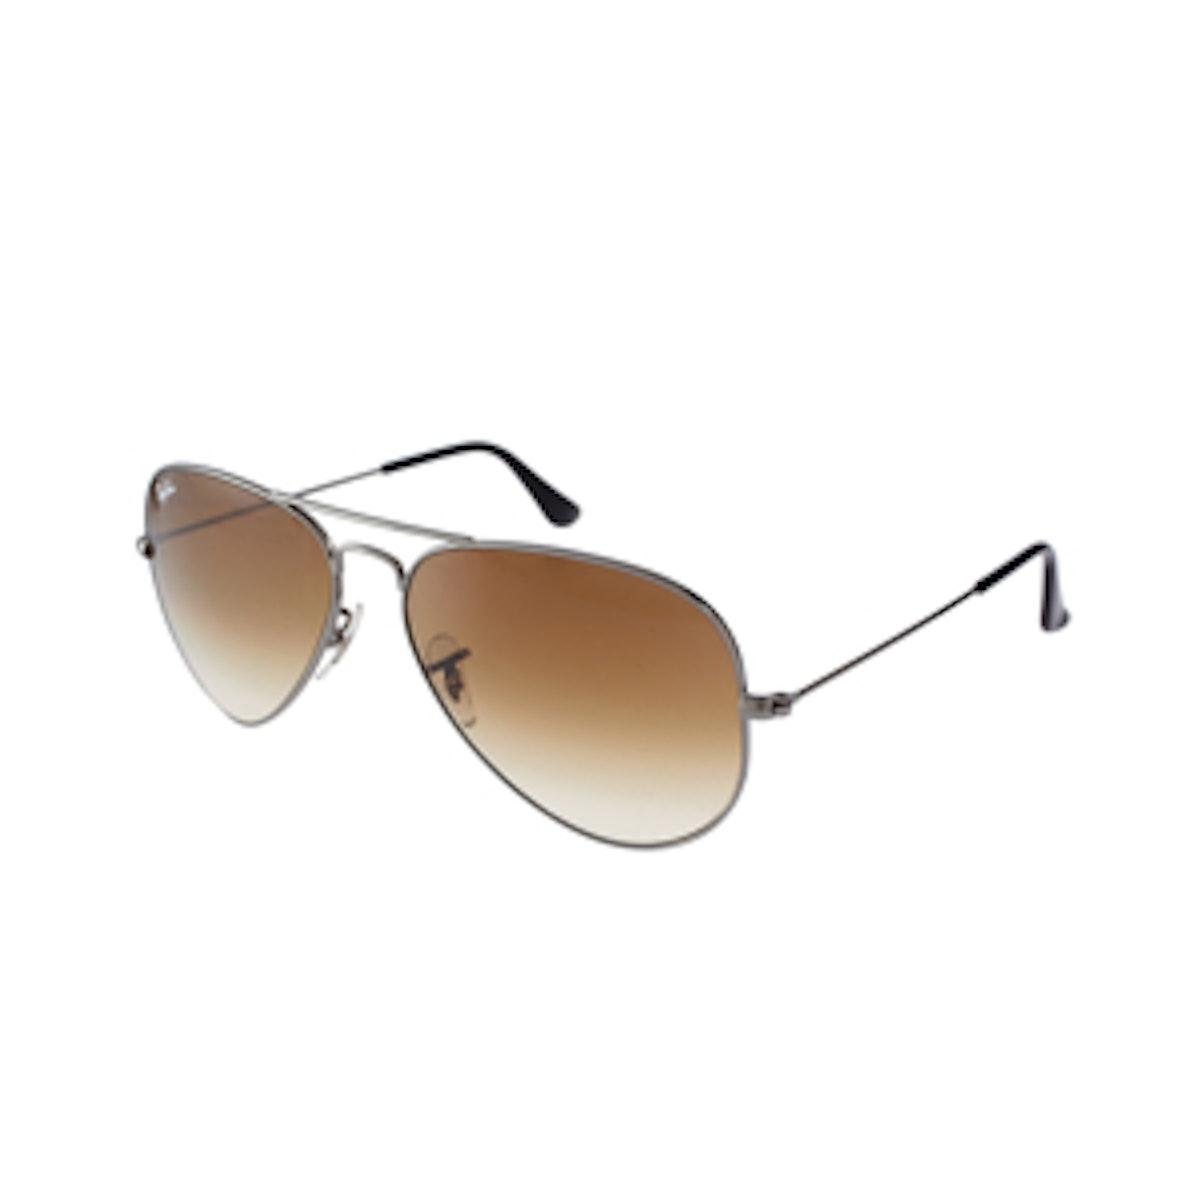 Large Aviator Sunglasses